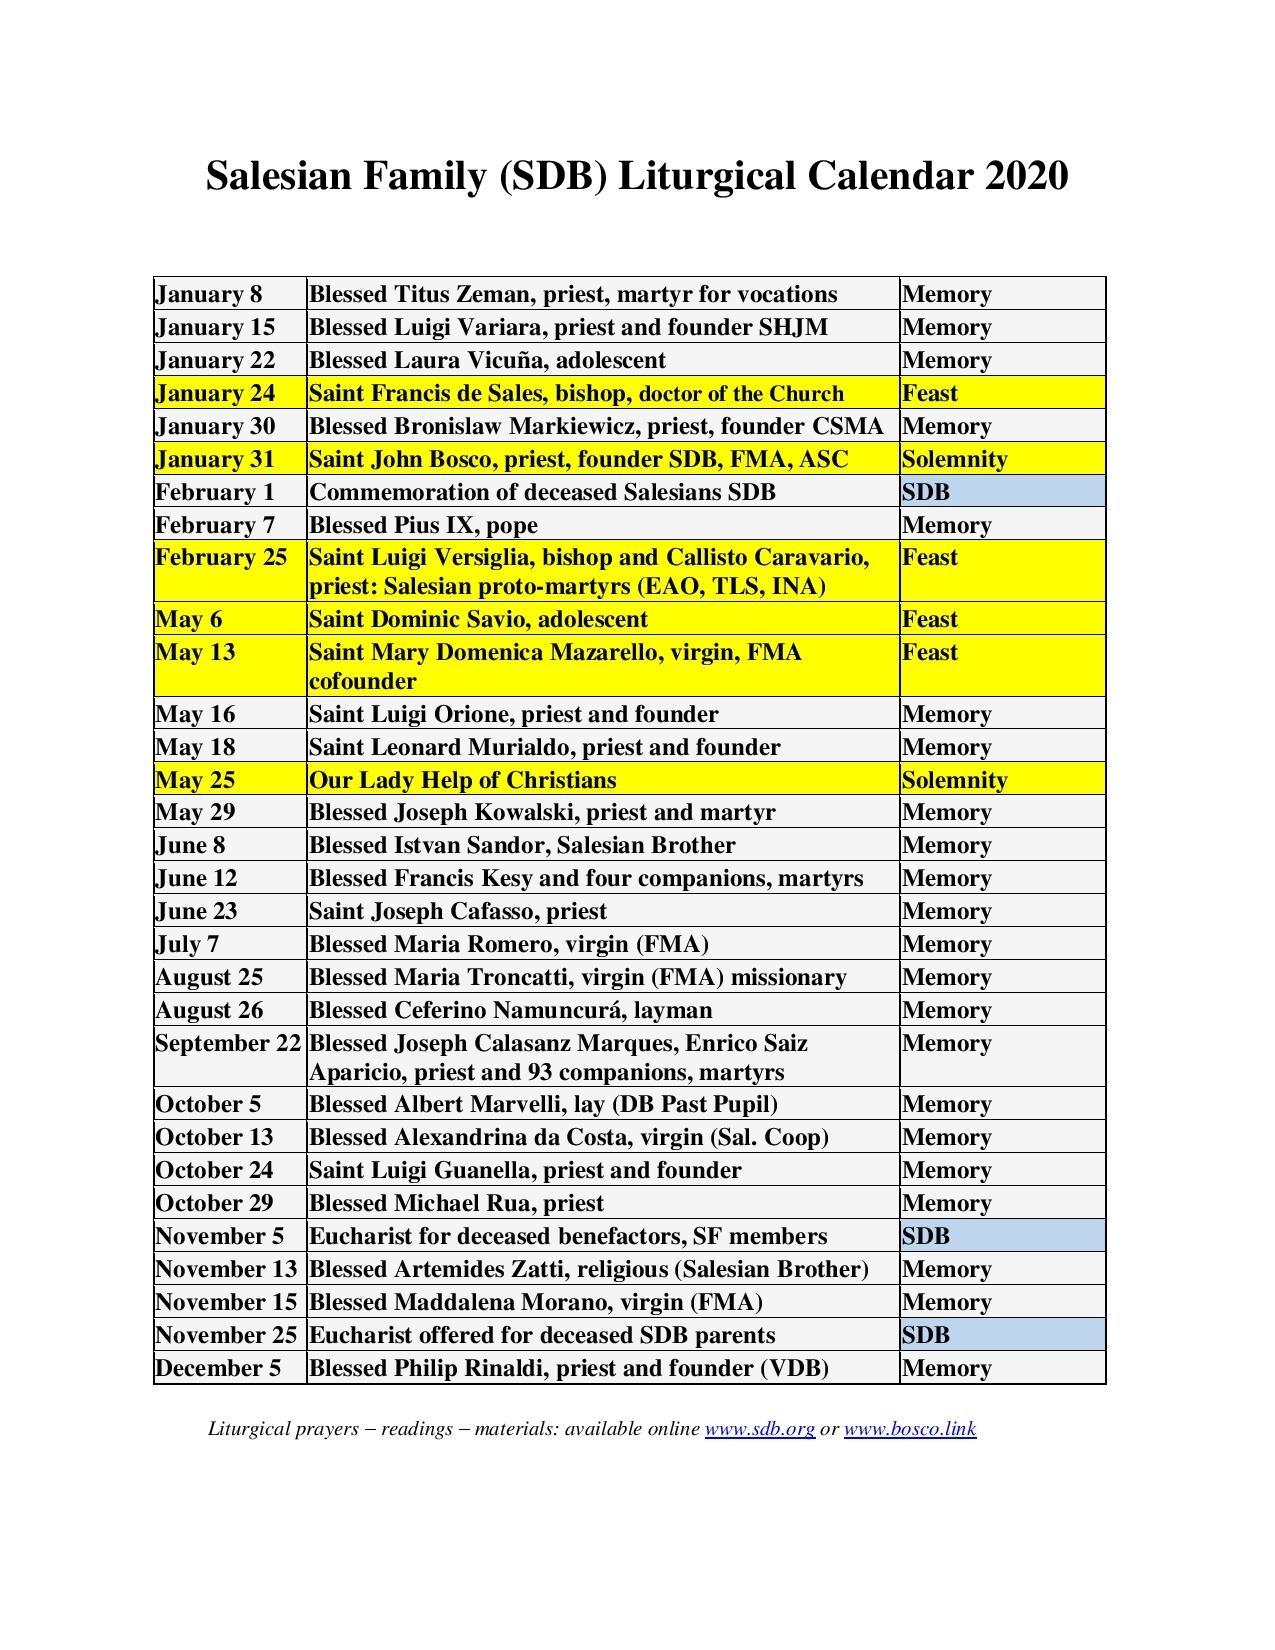 Resource - Salesian Liturgical Calendar 2020